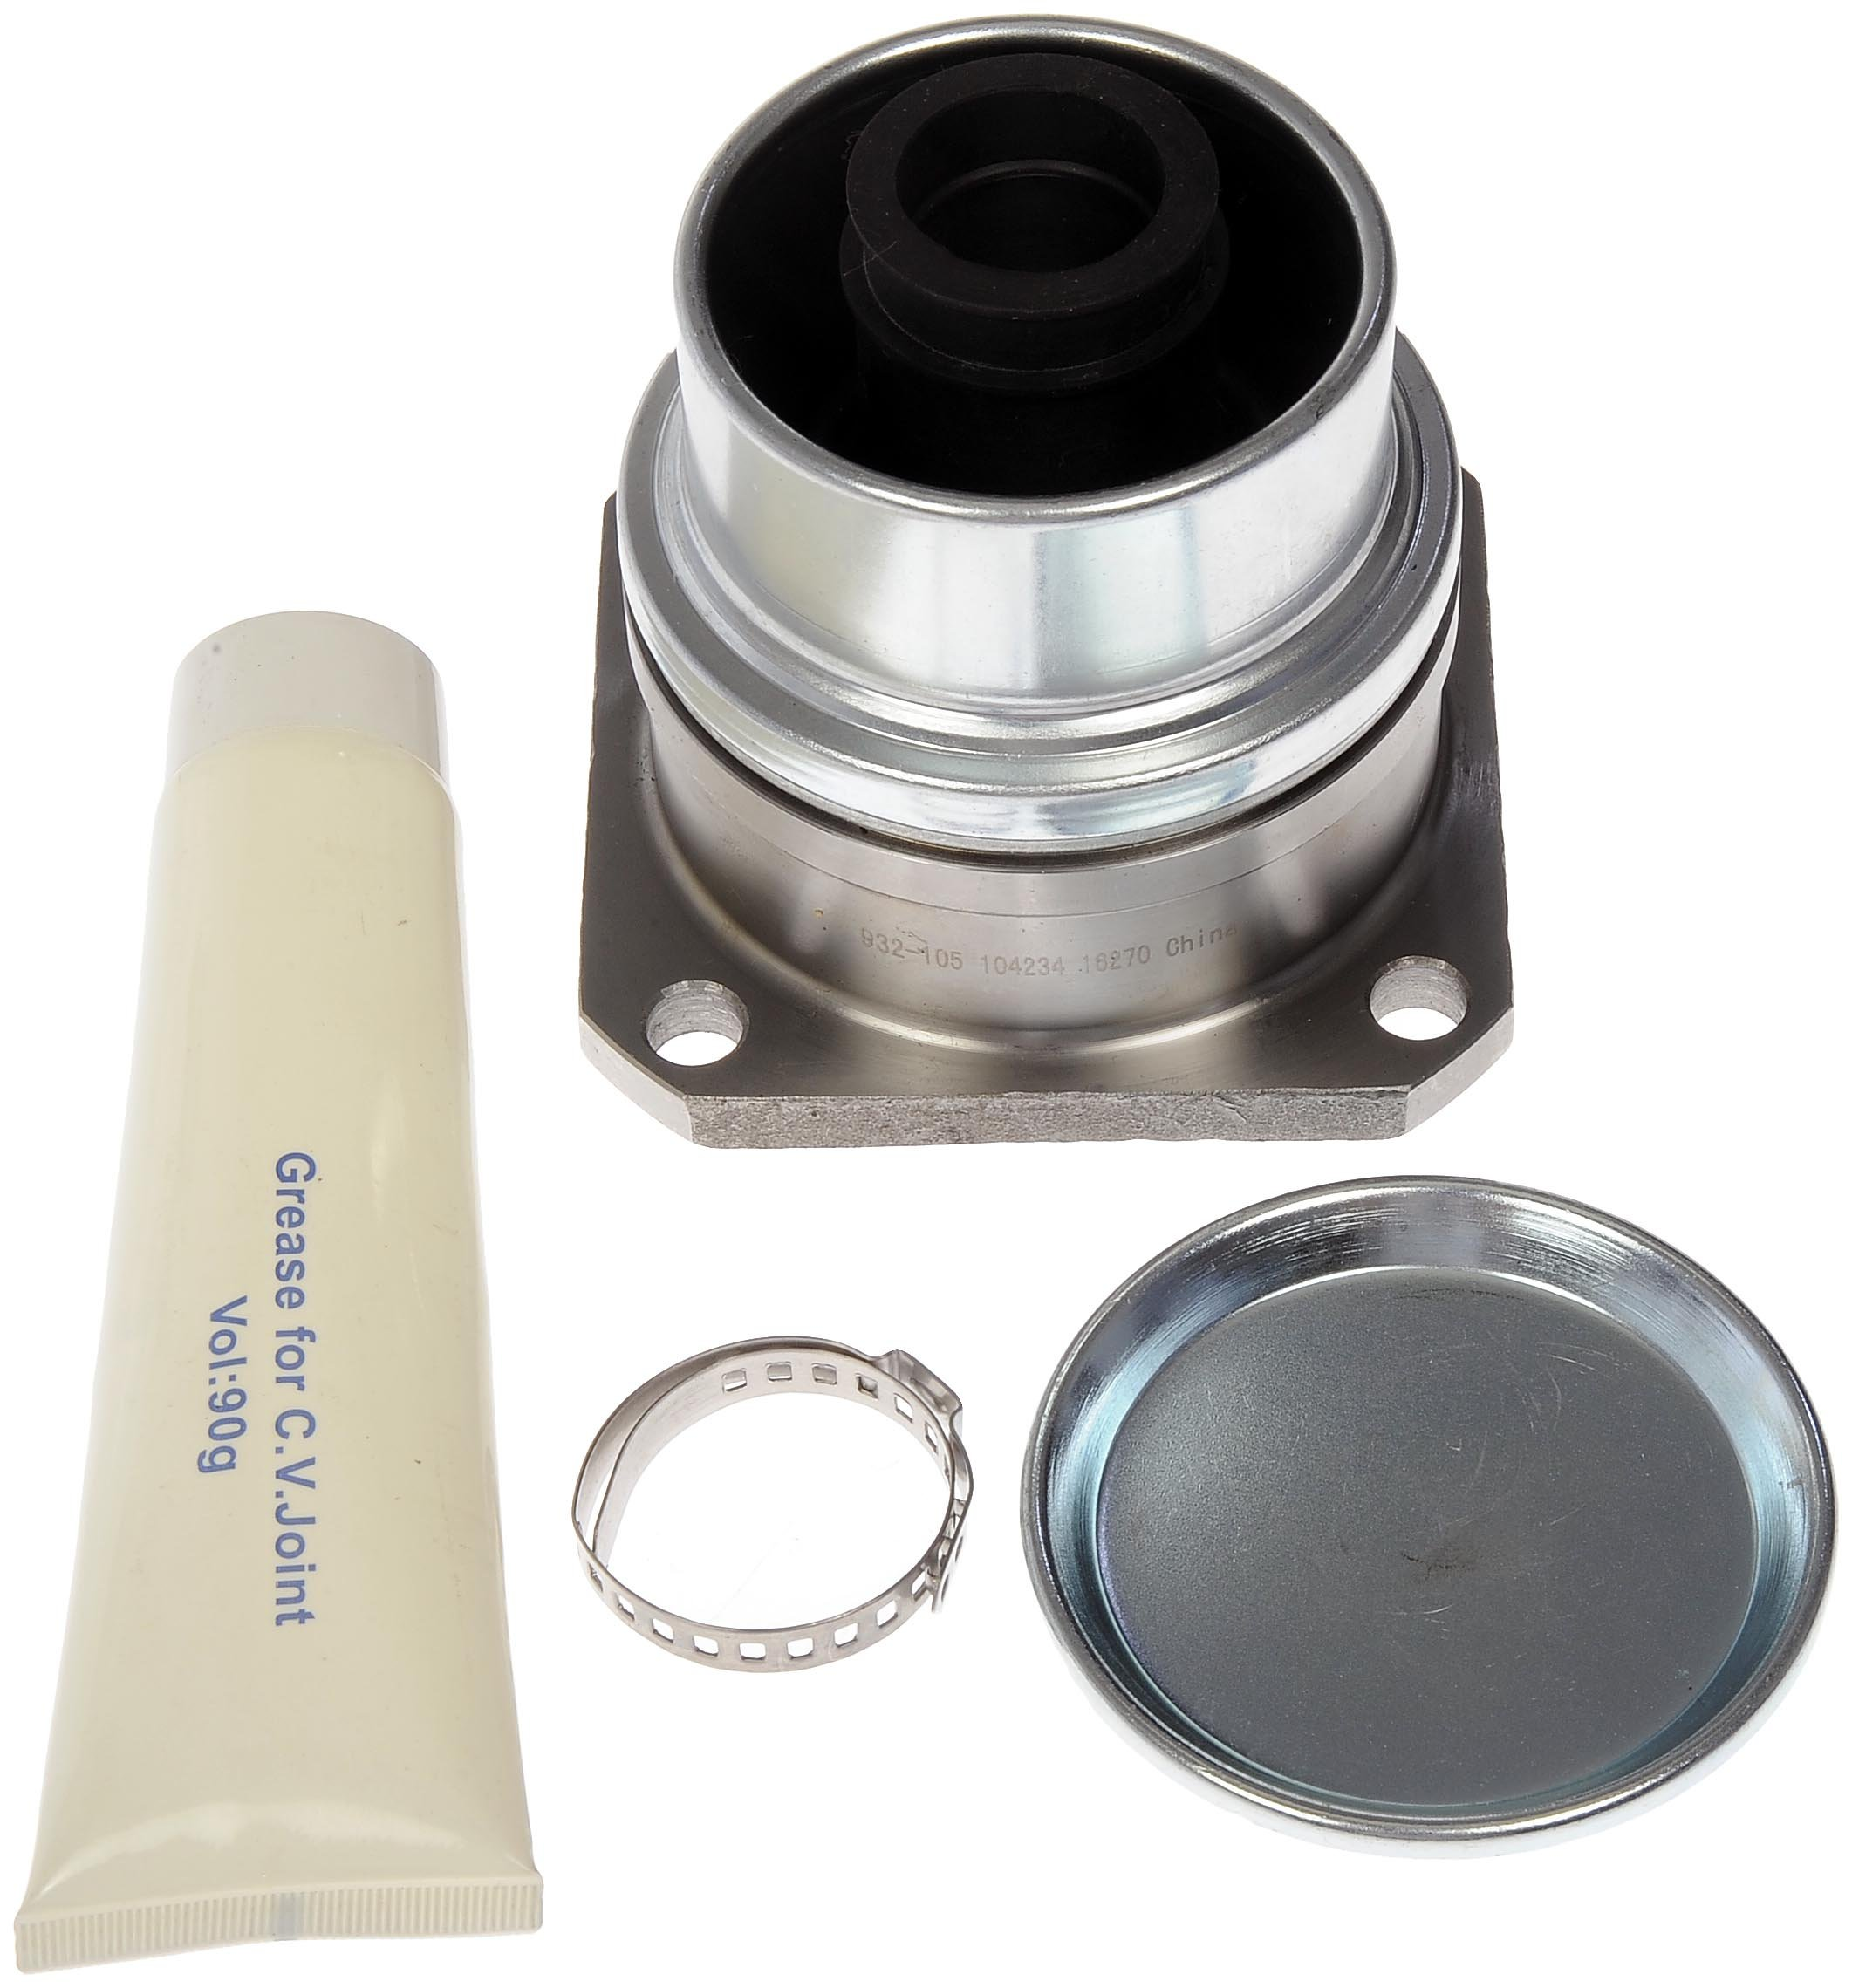 Dorman 932-105 High Speed Driveshaft CV Joint by Dorman (Image #1)